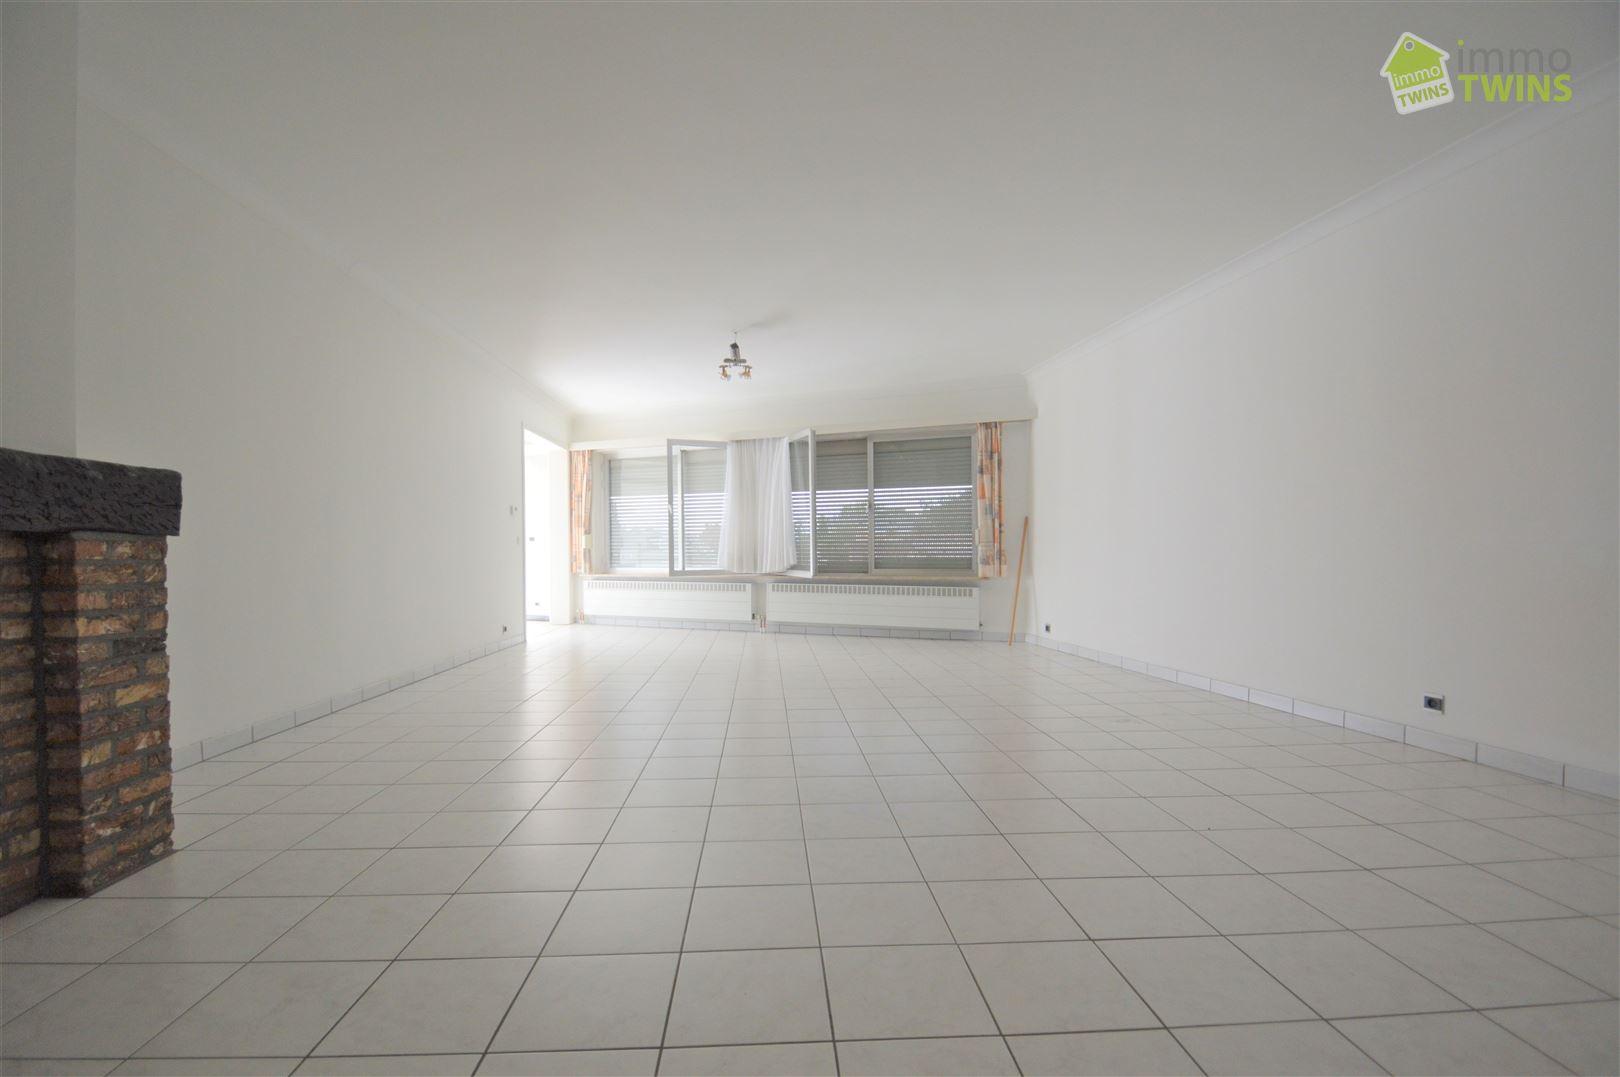 Foto 2 : Appartement te 9280 LEBBEKE (België) - Prijs € 625